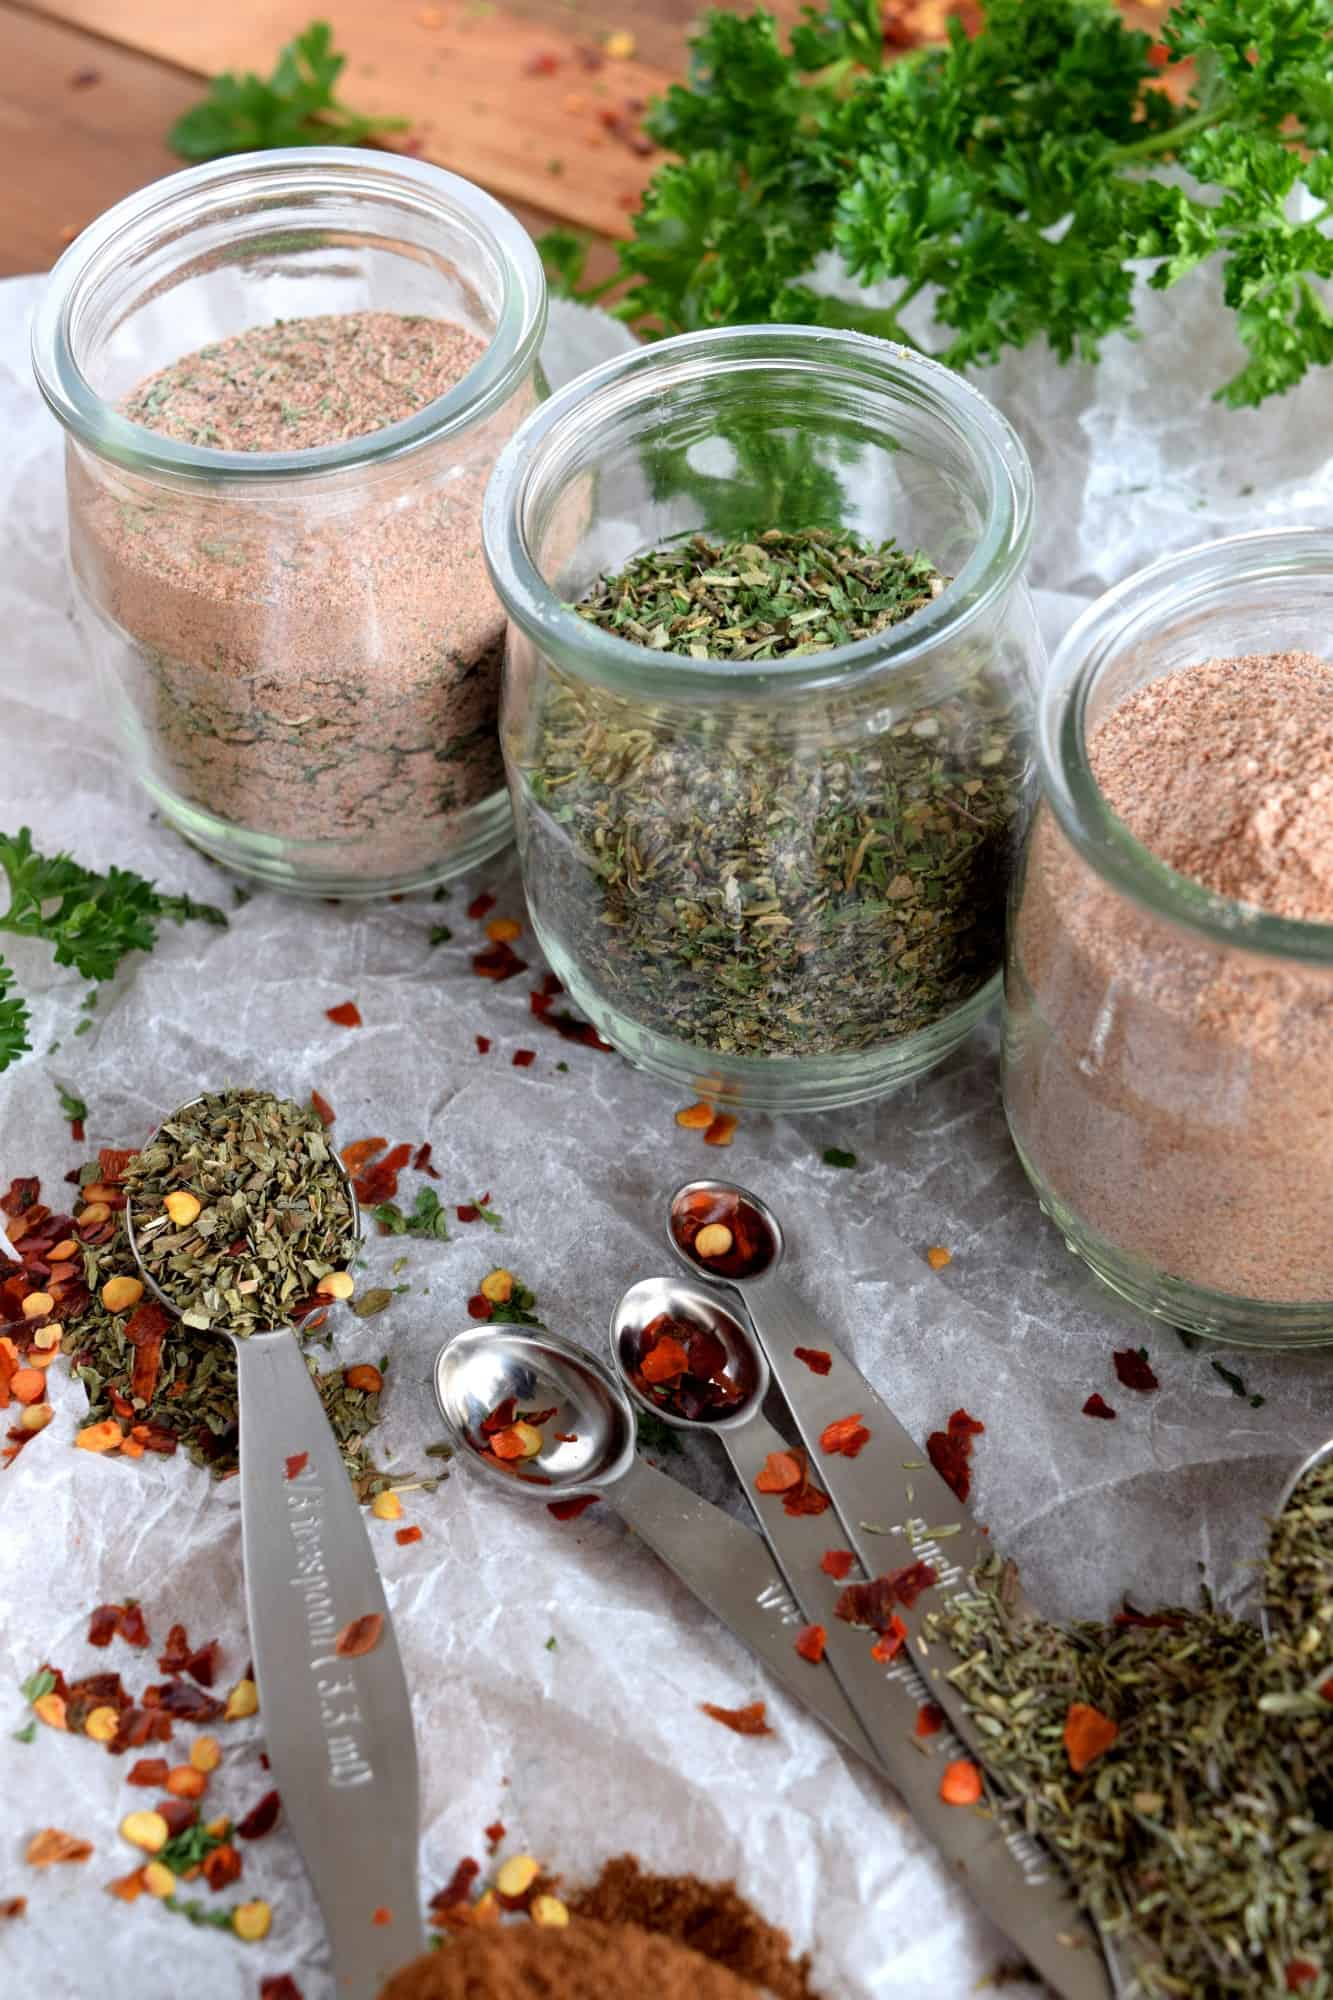 6 Seasoning Blends for Baked Chicken - CAJUN